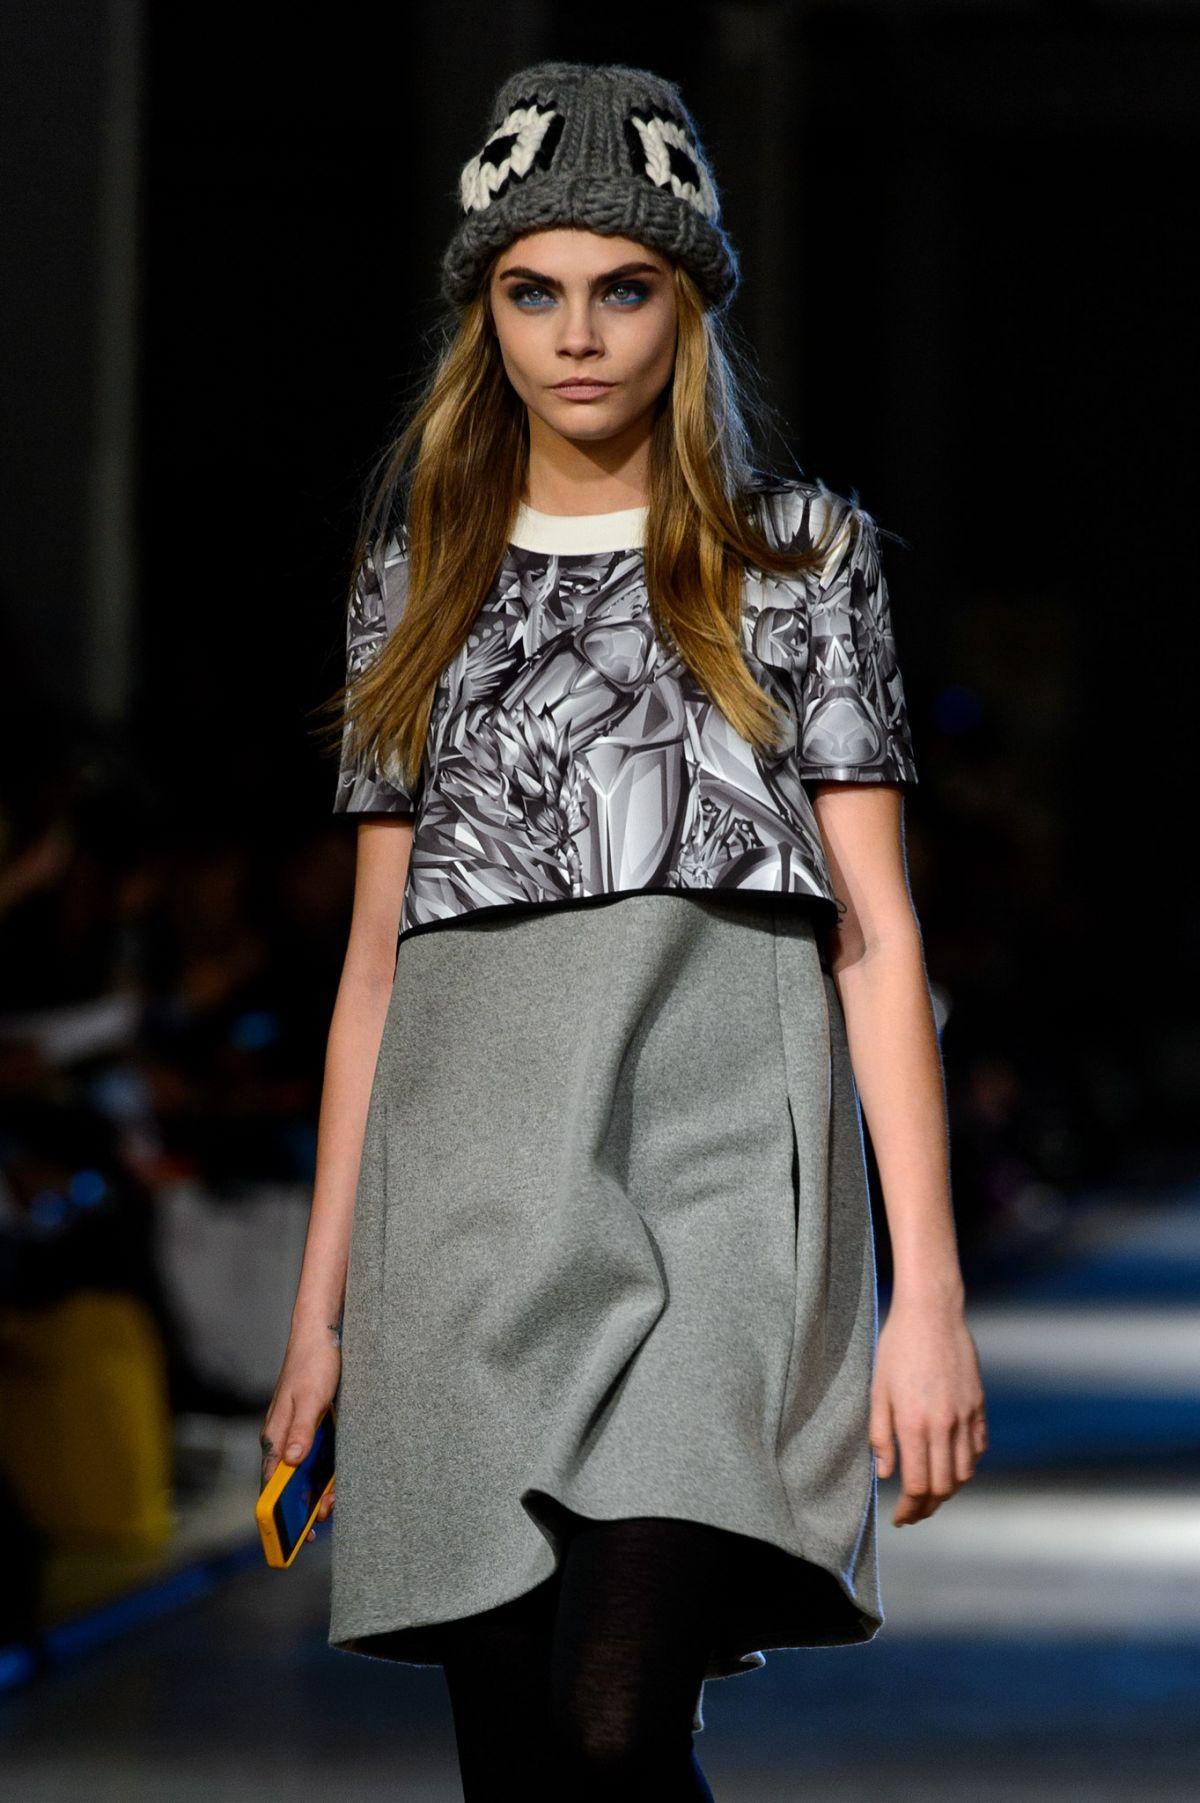 Cara Delevingne At Giles Fall Winter 2014 2015 Fashion Show Hawtcelebs Hawtcelebs